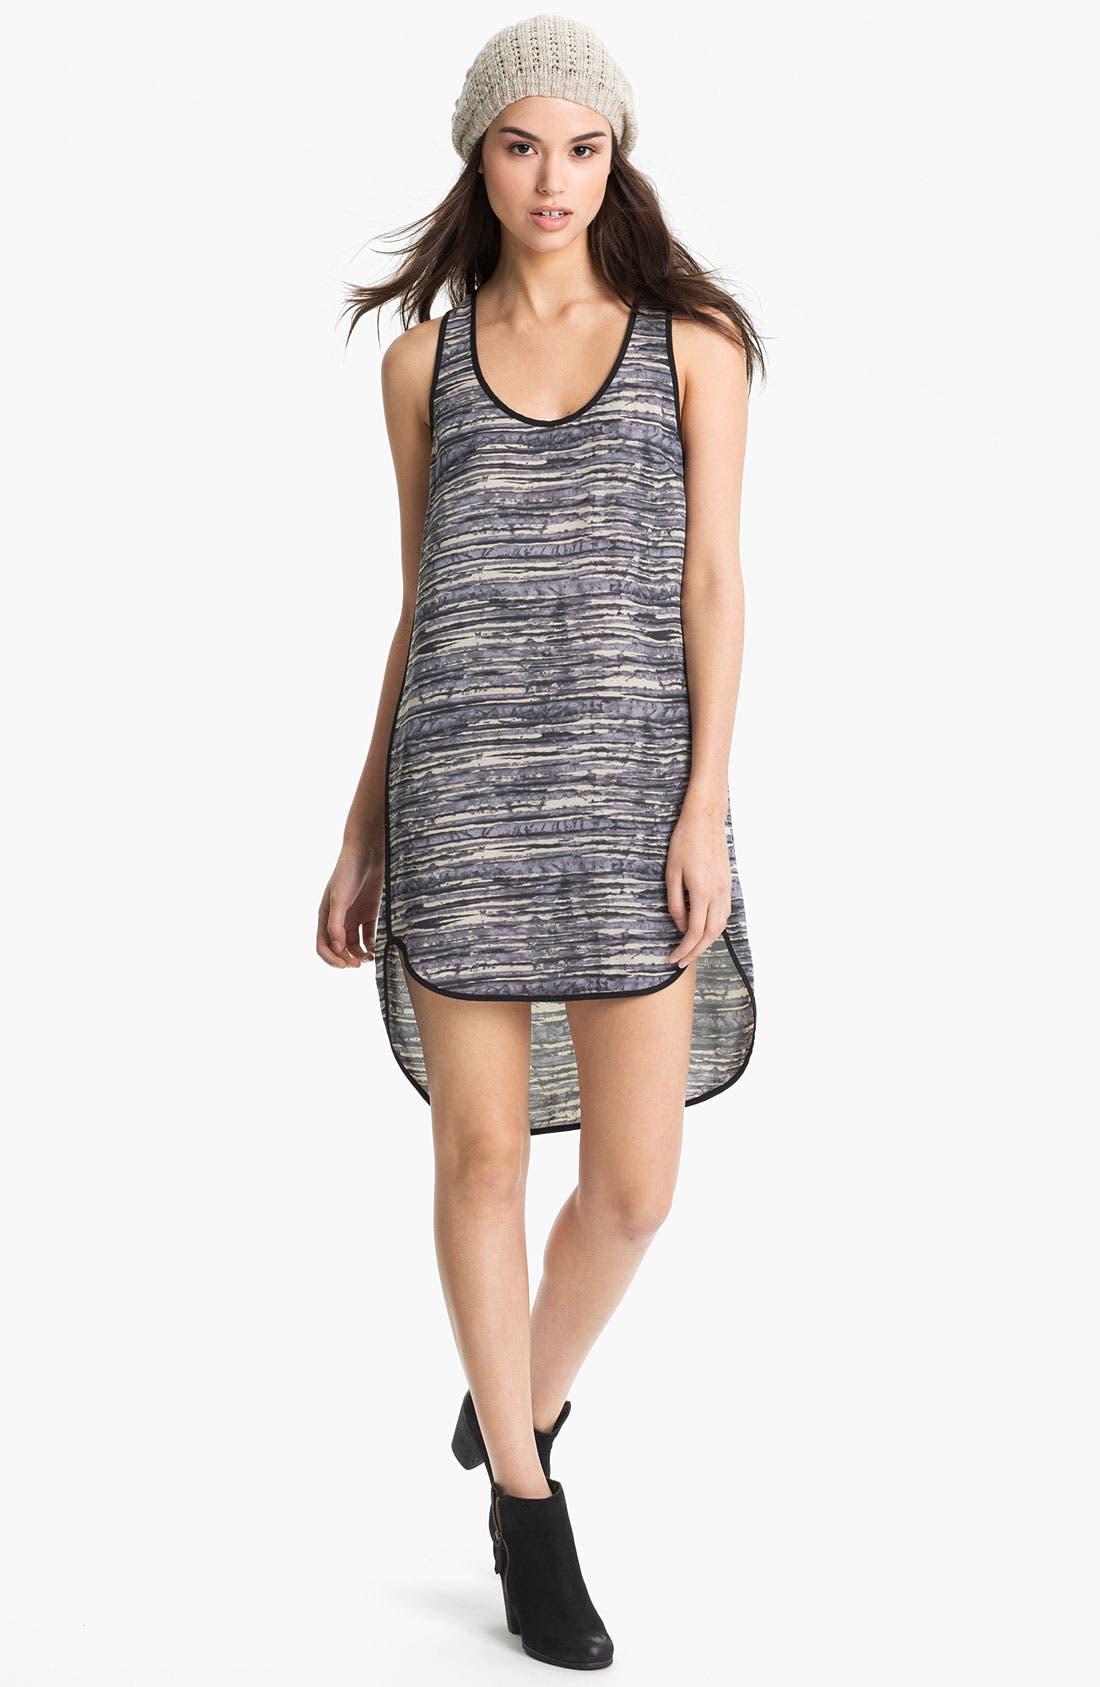 Alternate Image 1 Selected - Lush Print High/Low Tank Dress (Juniors)